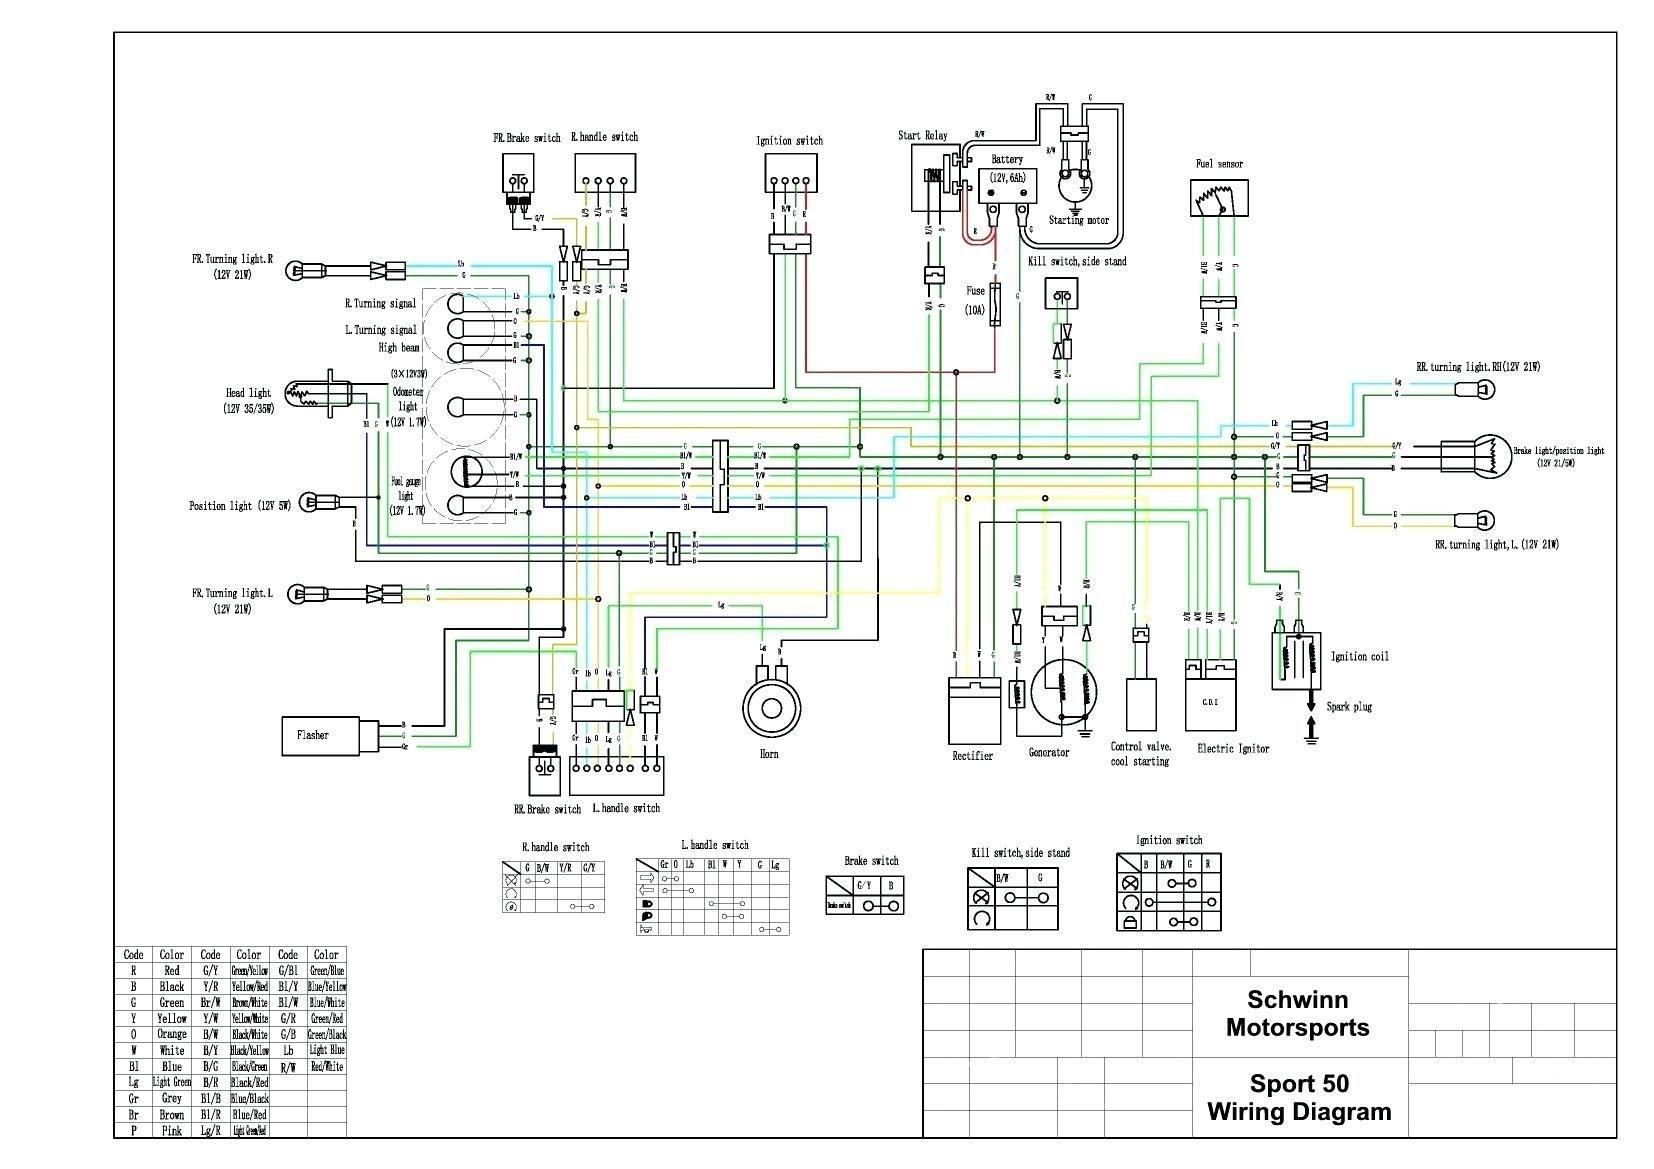 Wiring Diagram For Tao Tao 110Cc 4 Wheeler | Wiring Diagram - Chinese 4 Wheeler Wiring Diagram